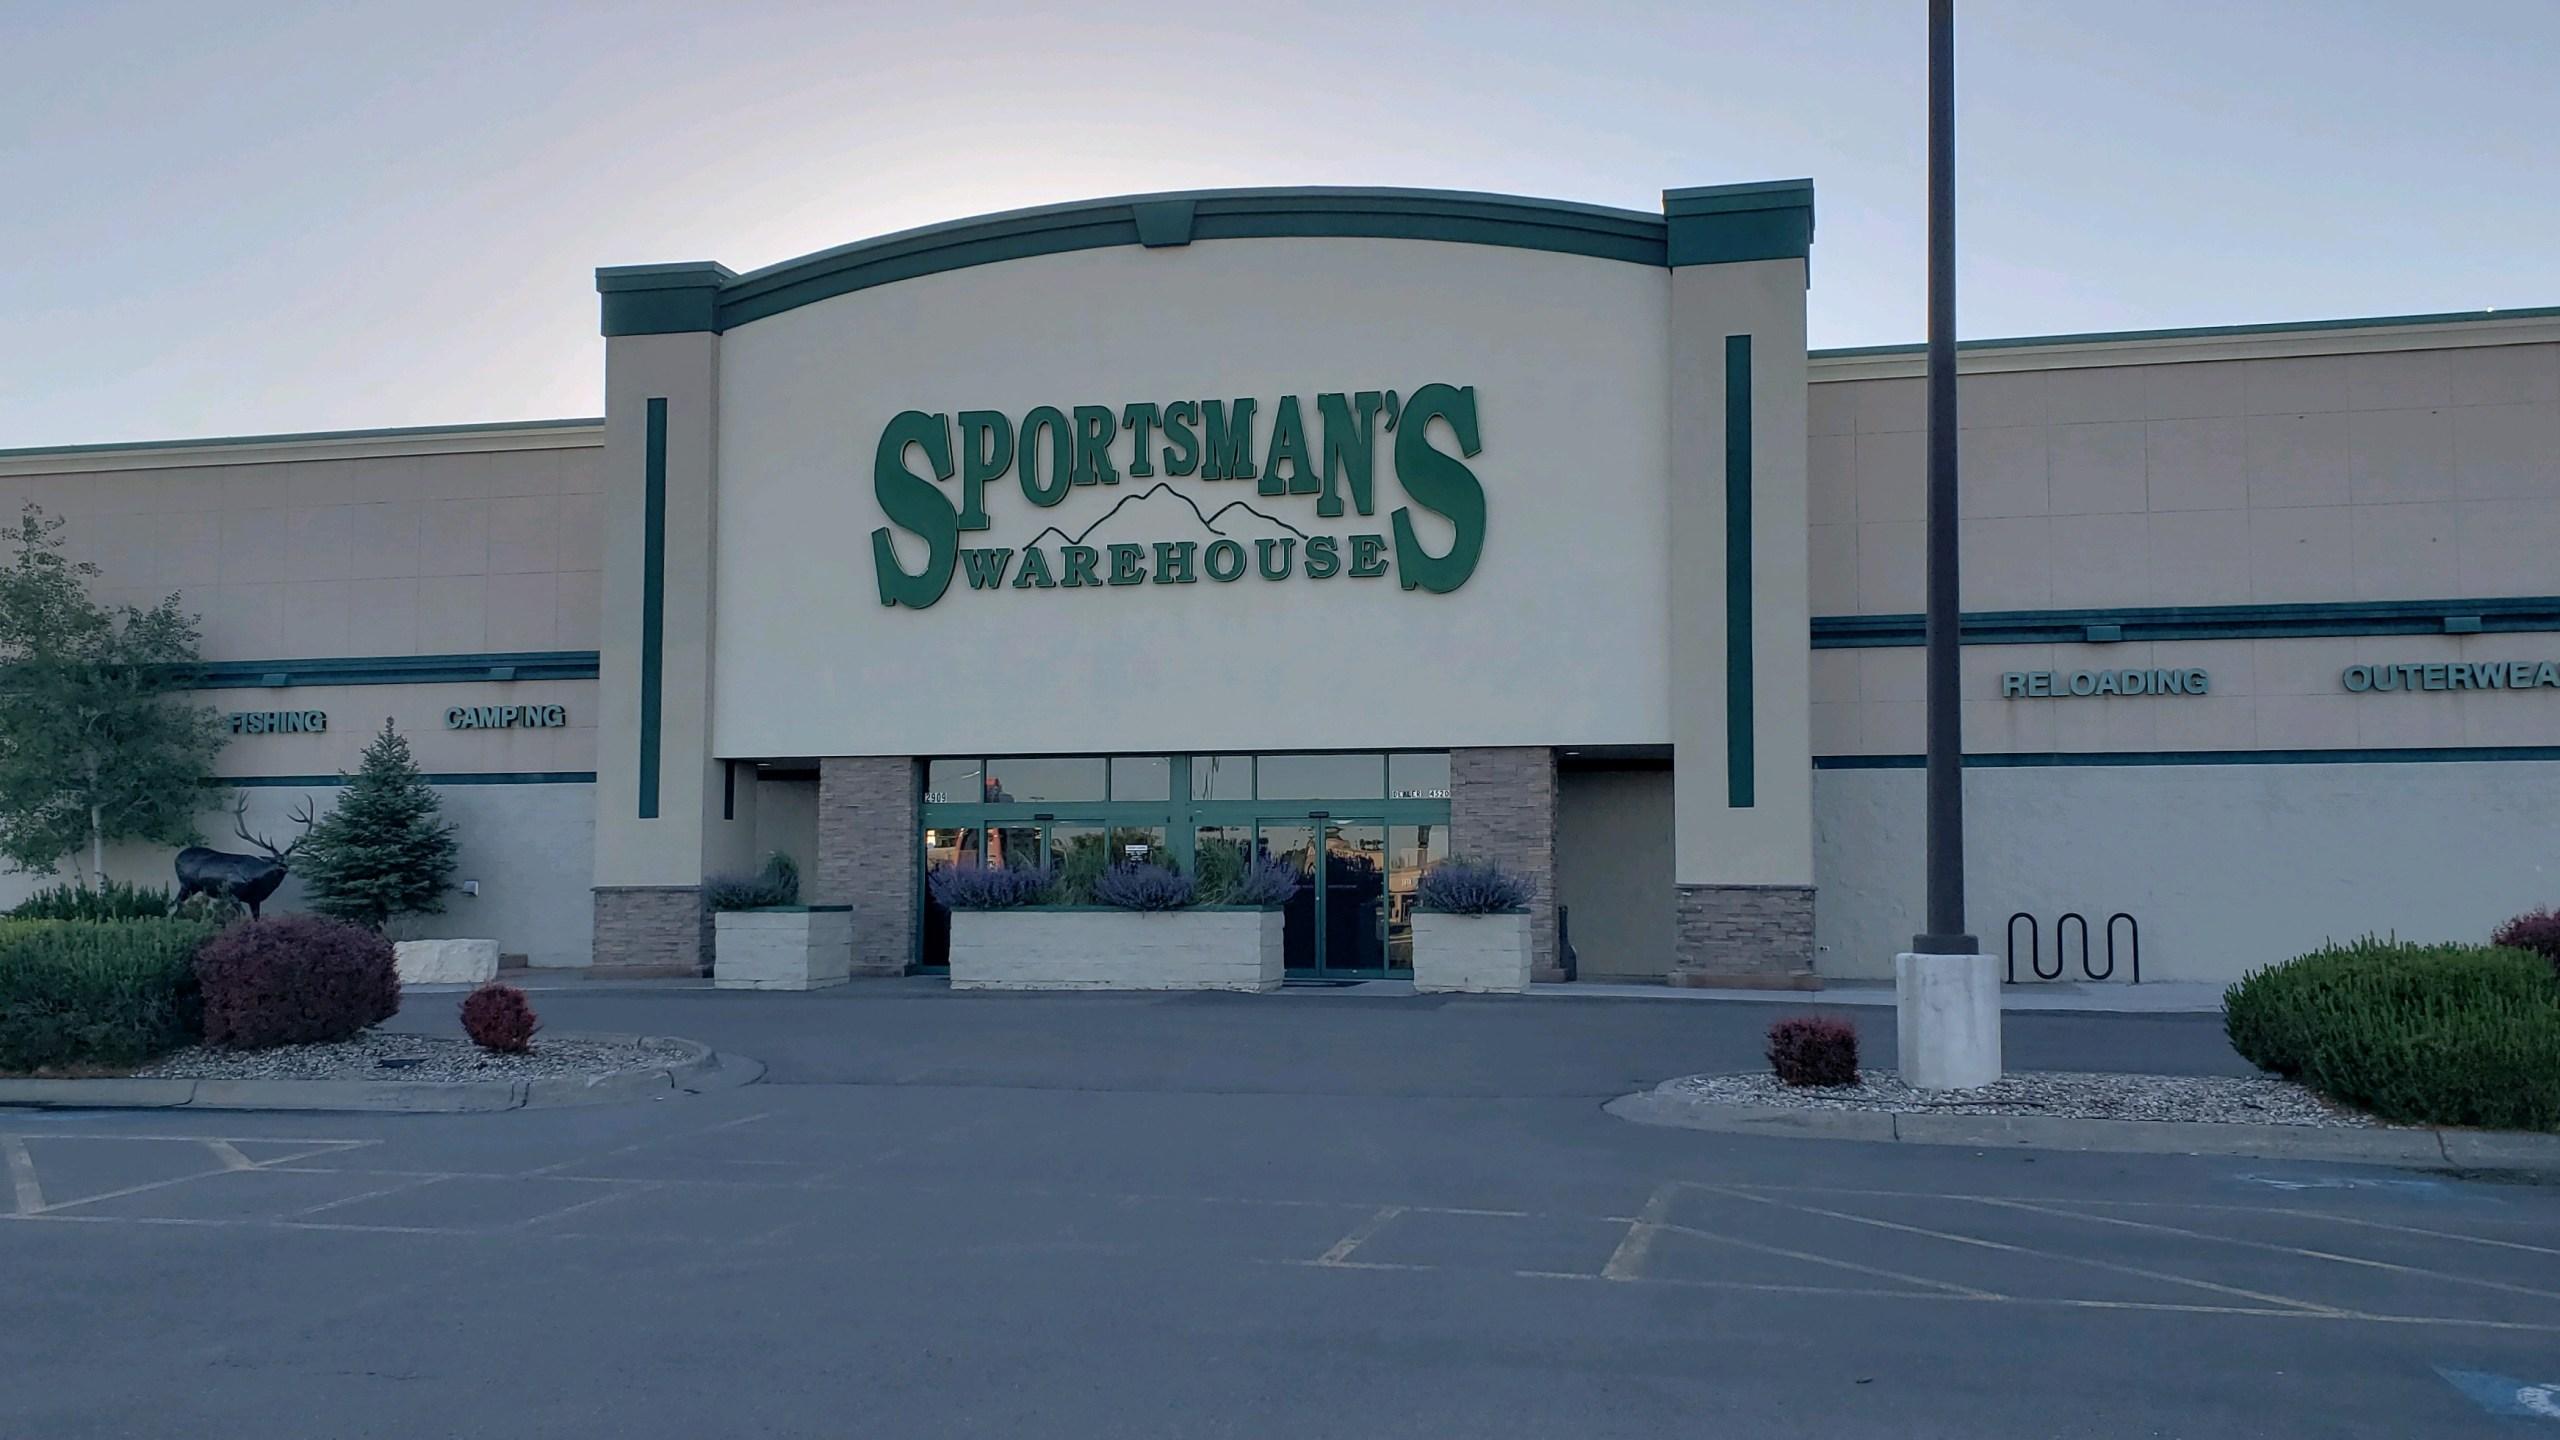 Sportsman's Warehouse file photo